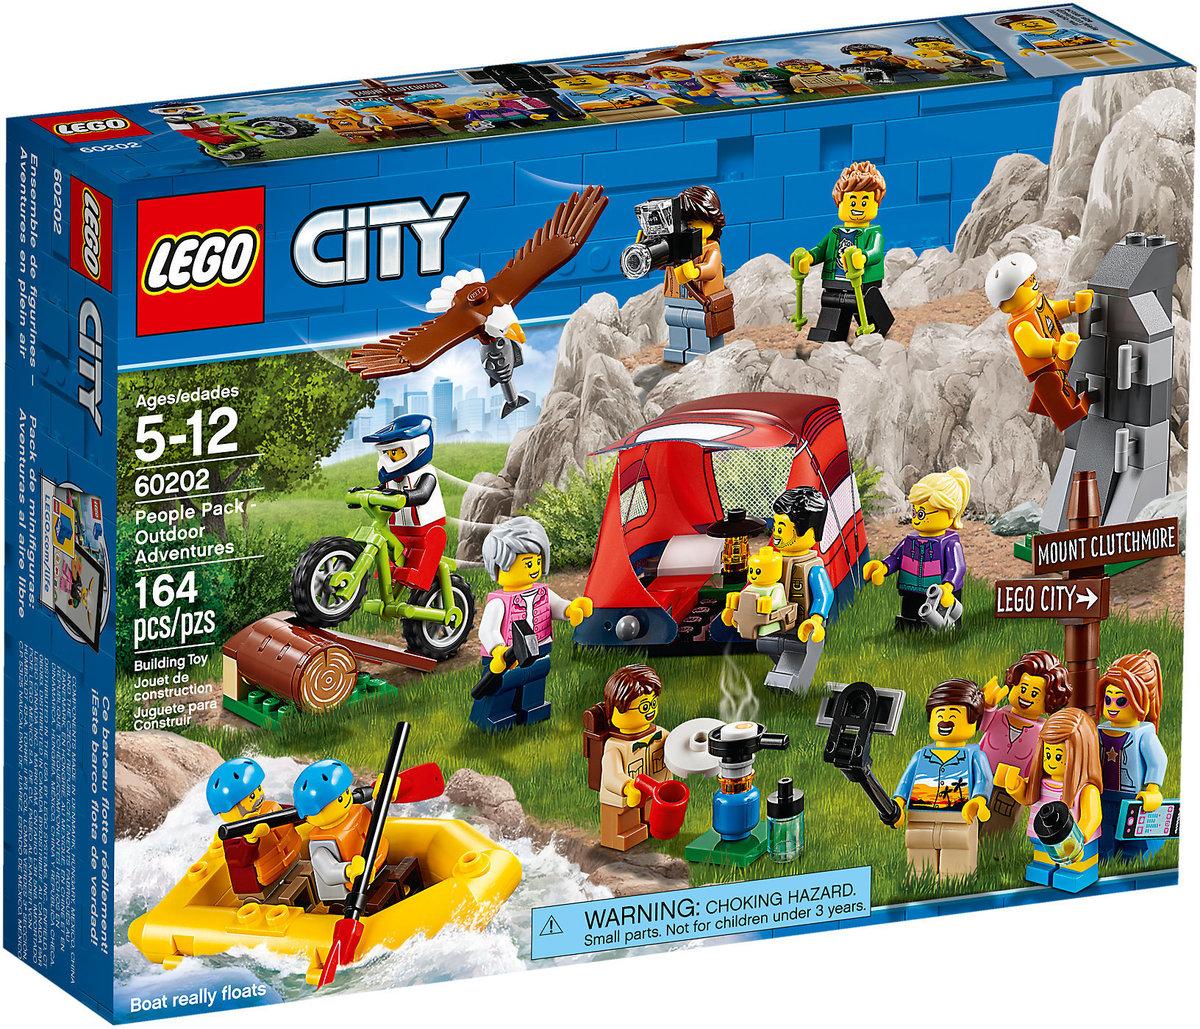 LEGO 60202 City - People Pack - Outdoor Adventures